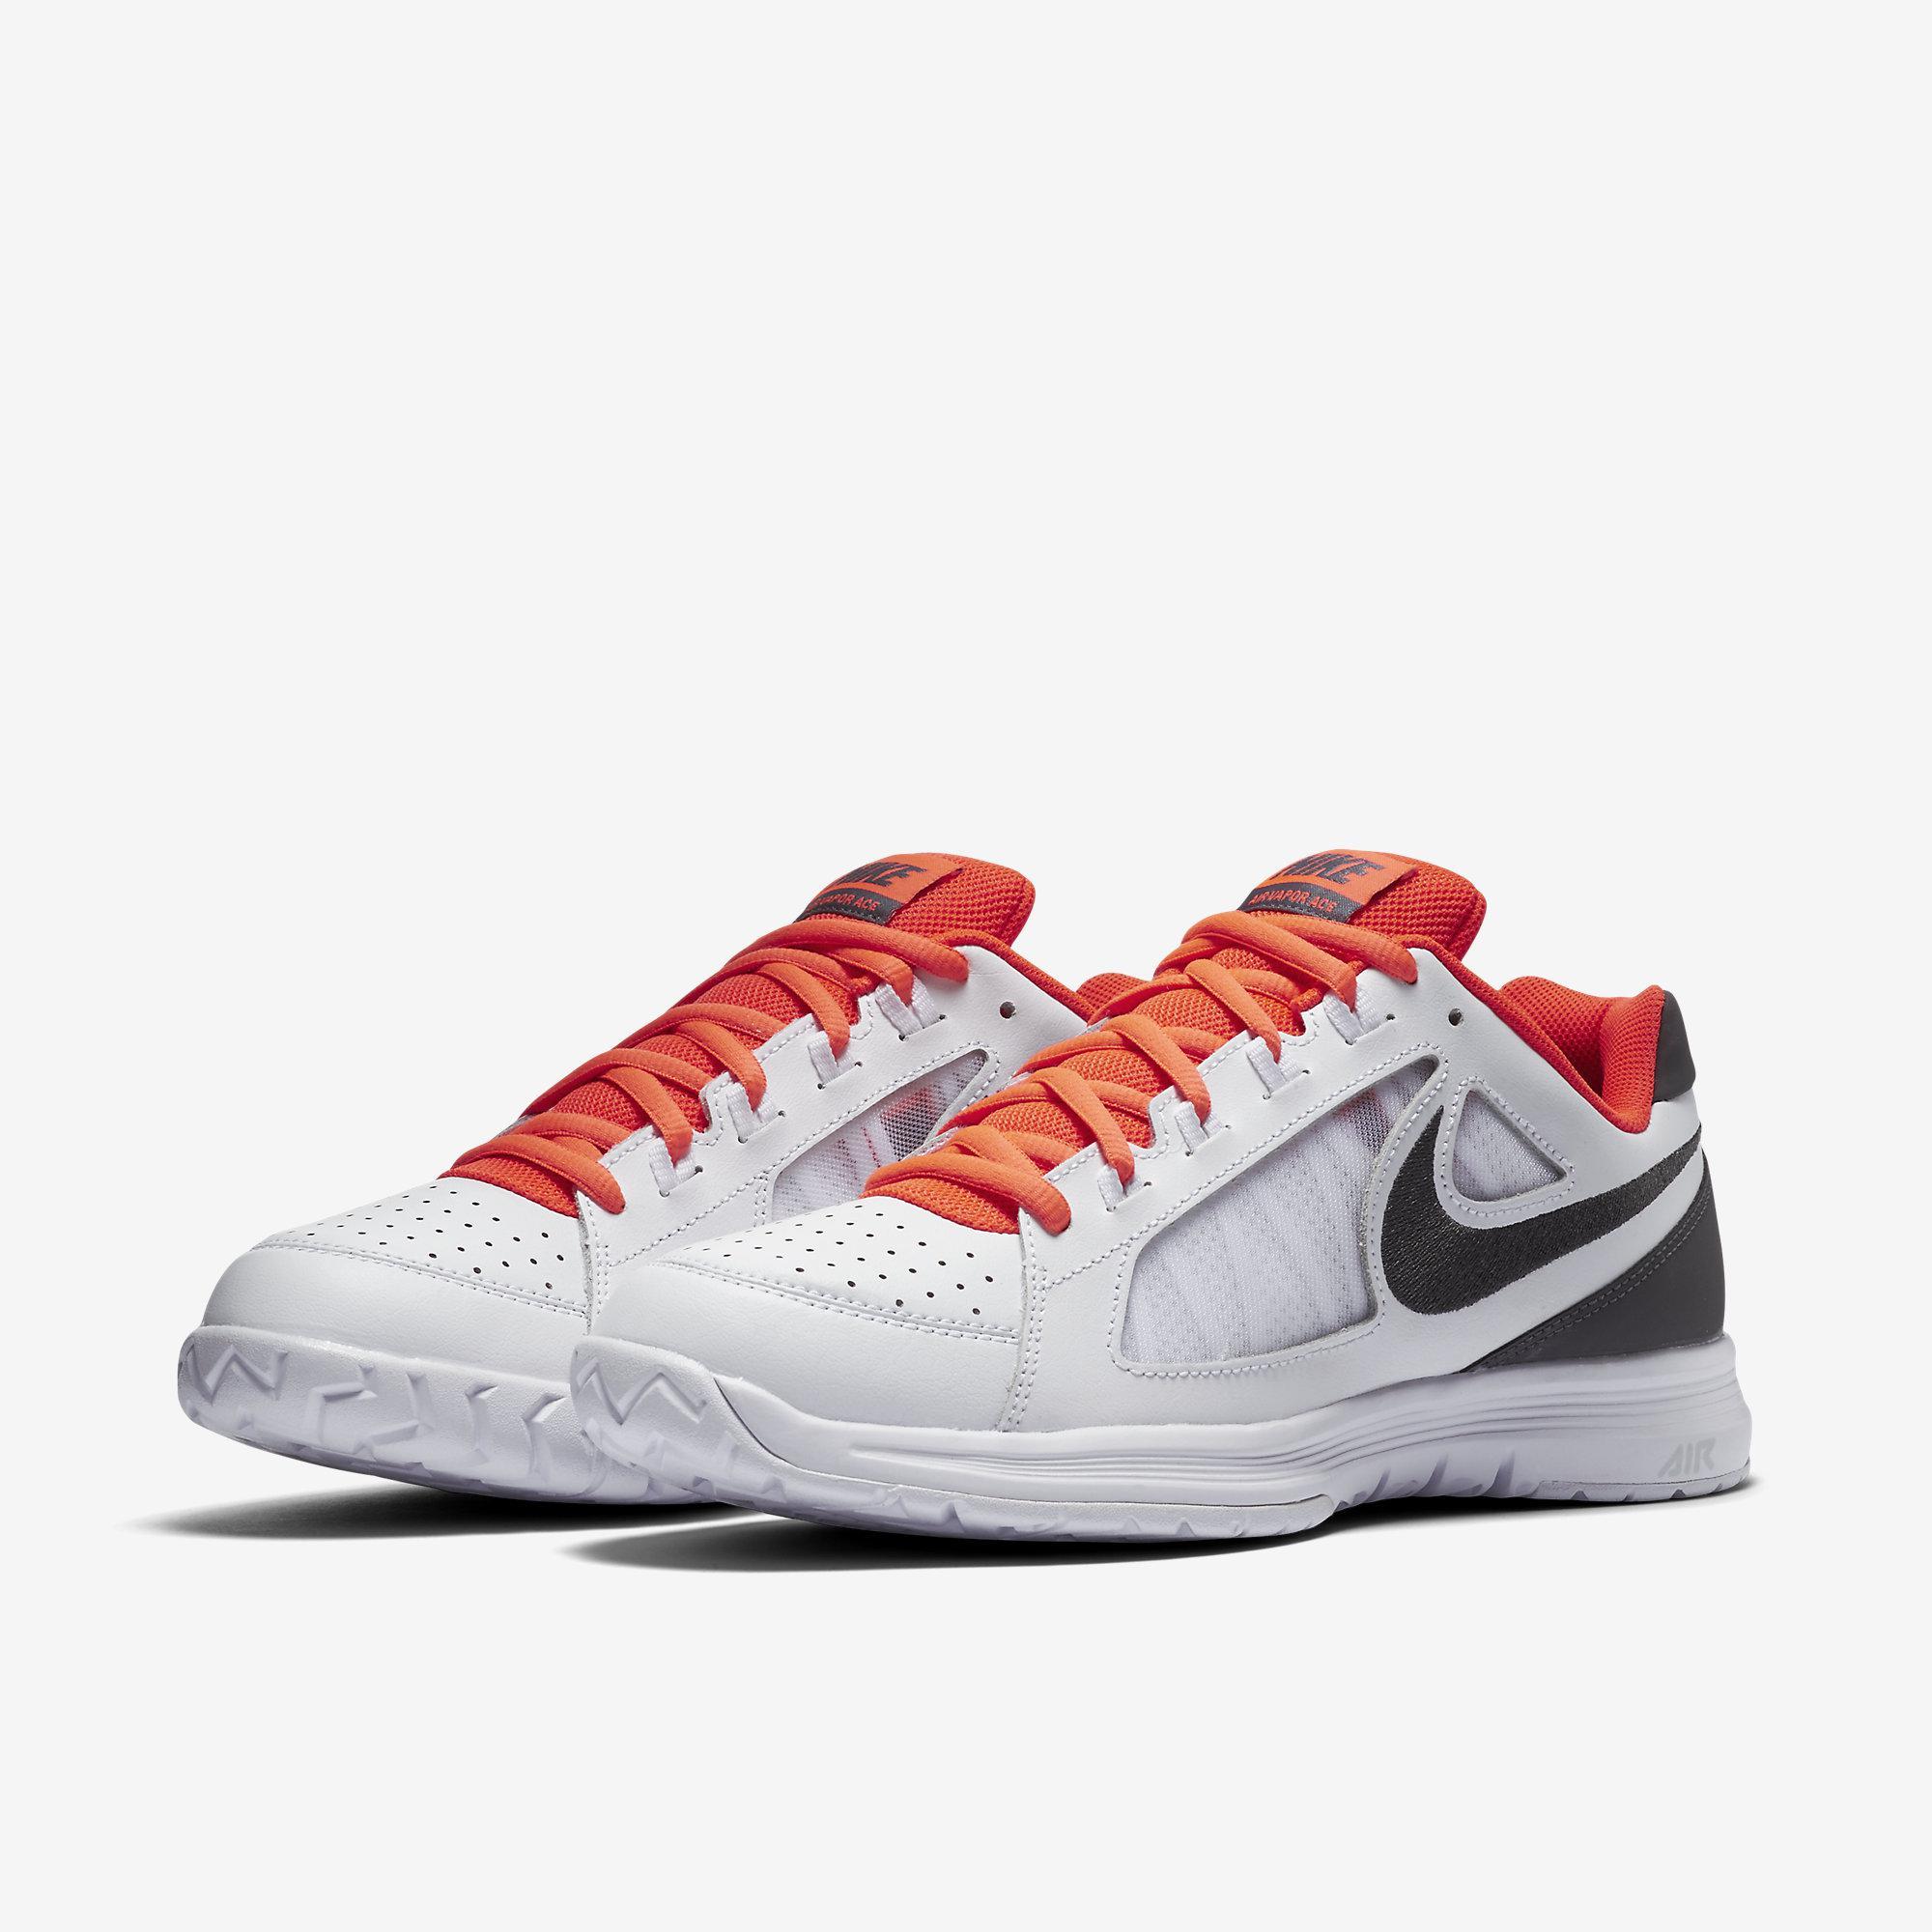 6eb56694d82c0 Nike Mens Air Vapor Ace Tennis Shoes - White Grey - Tennisnuts.com